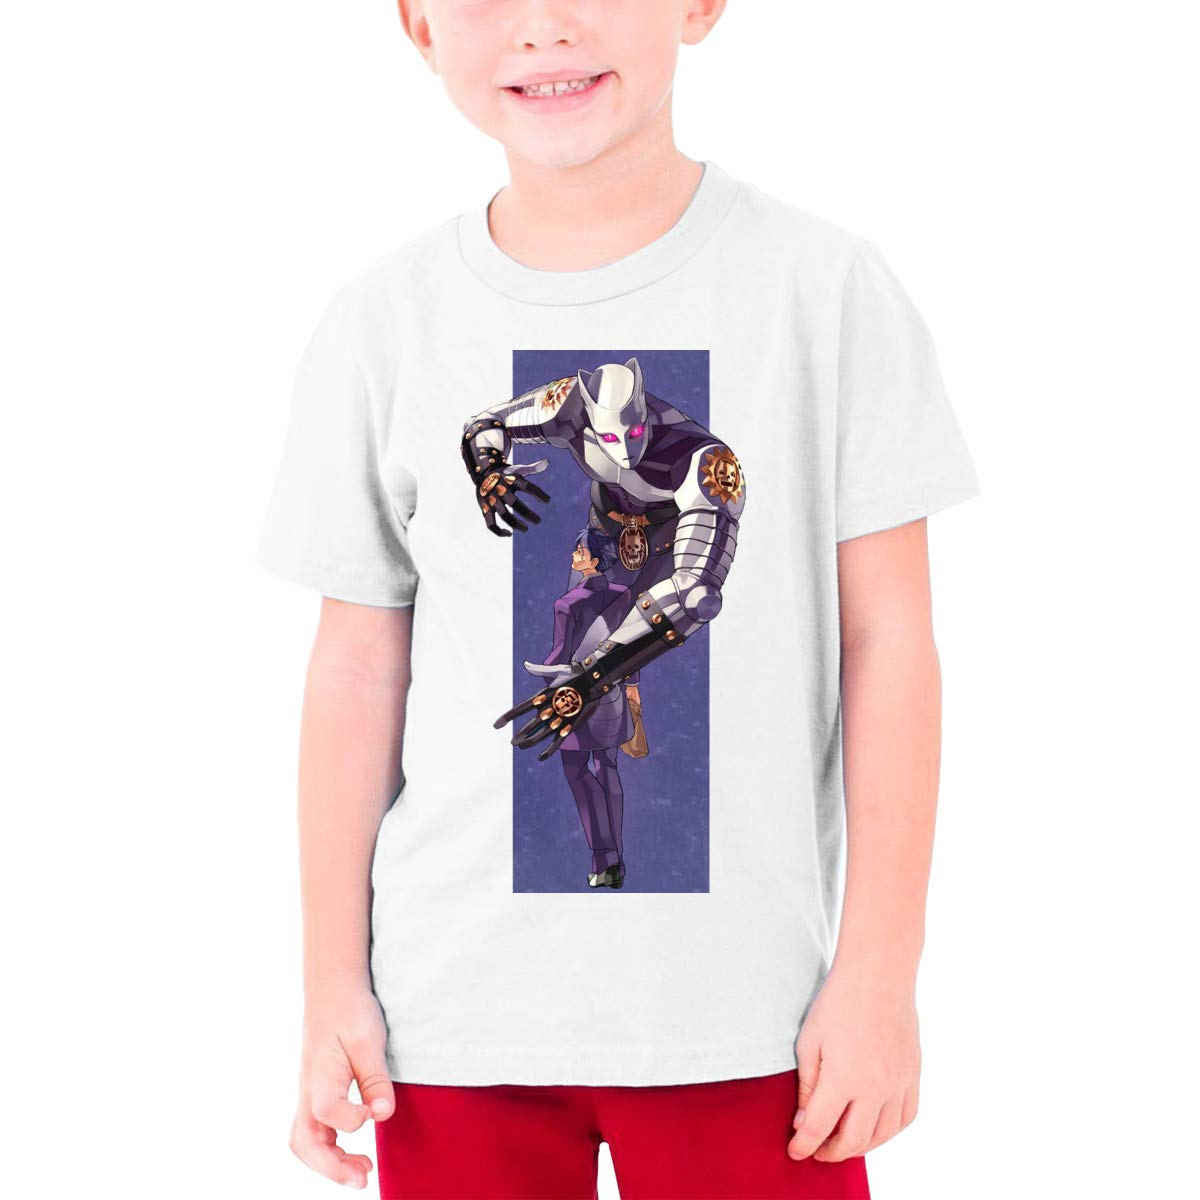 Censu Personalized Fashion Kira Yoshikage O-neck T Shirts For Teens, Black